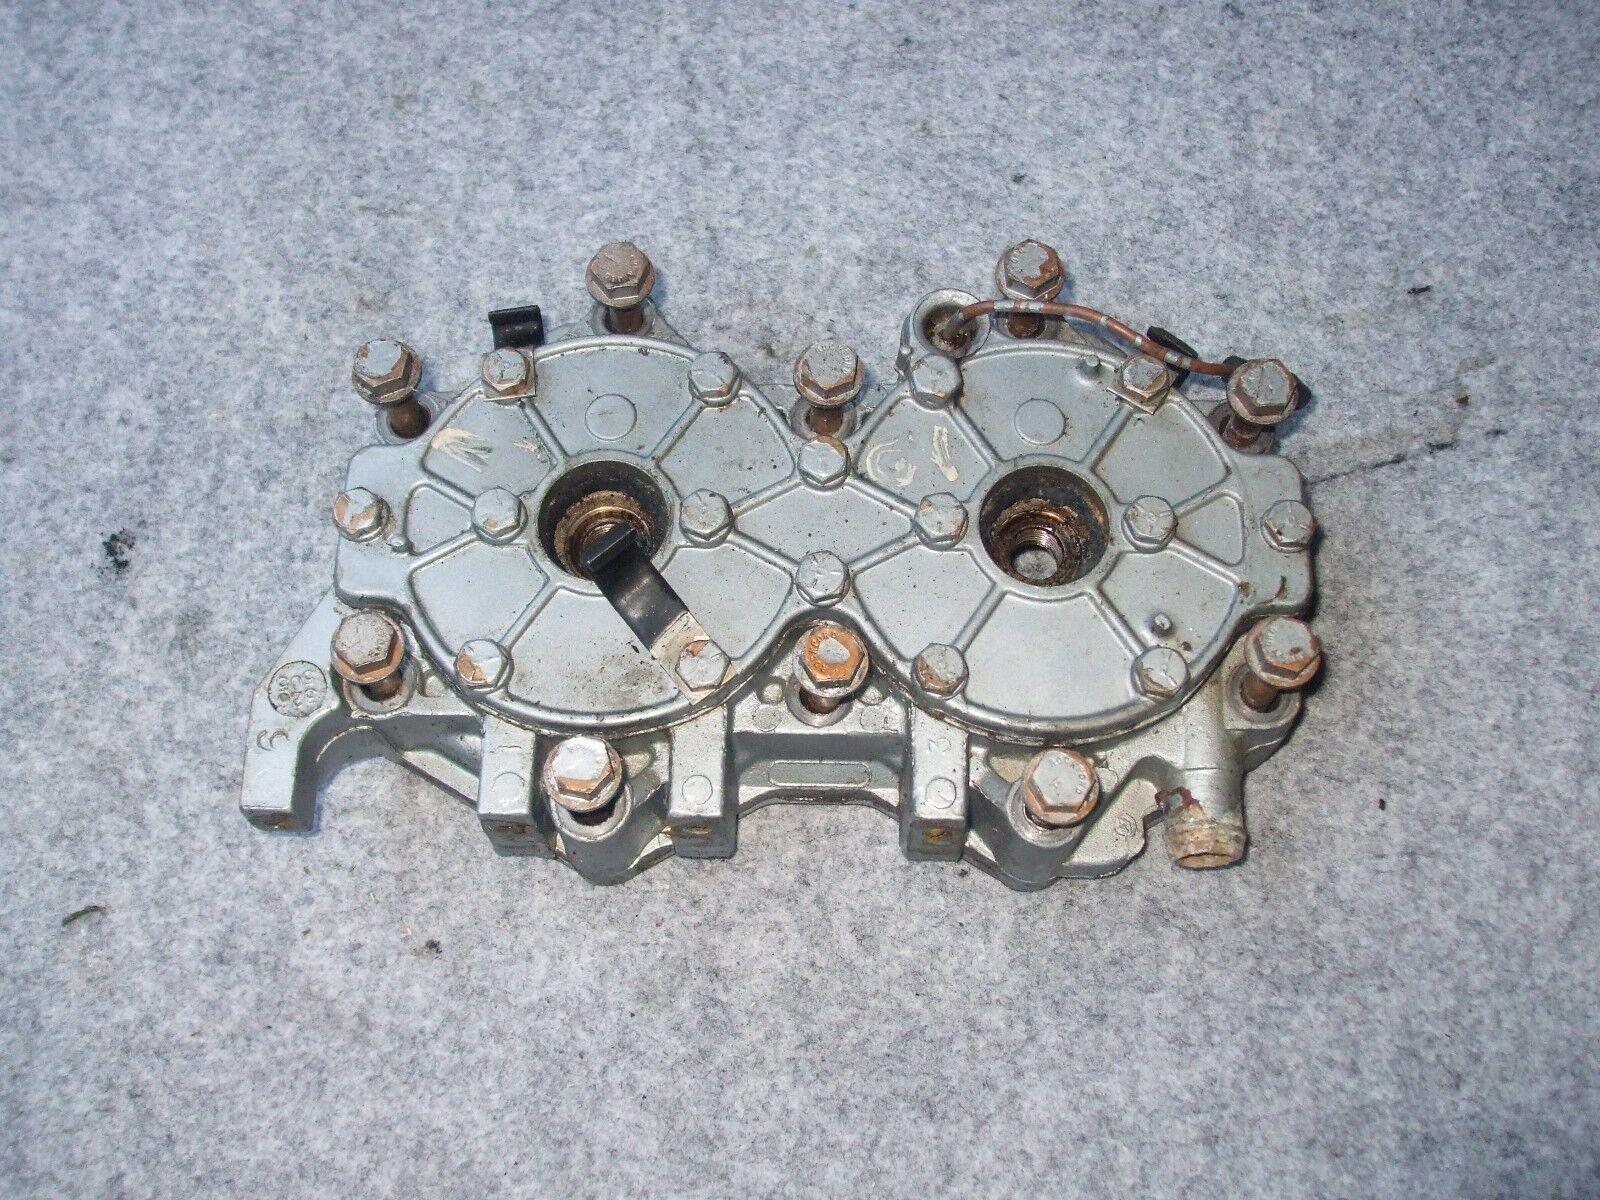 Evinrude, johnson 90. V4. Zylinderkopf L.